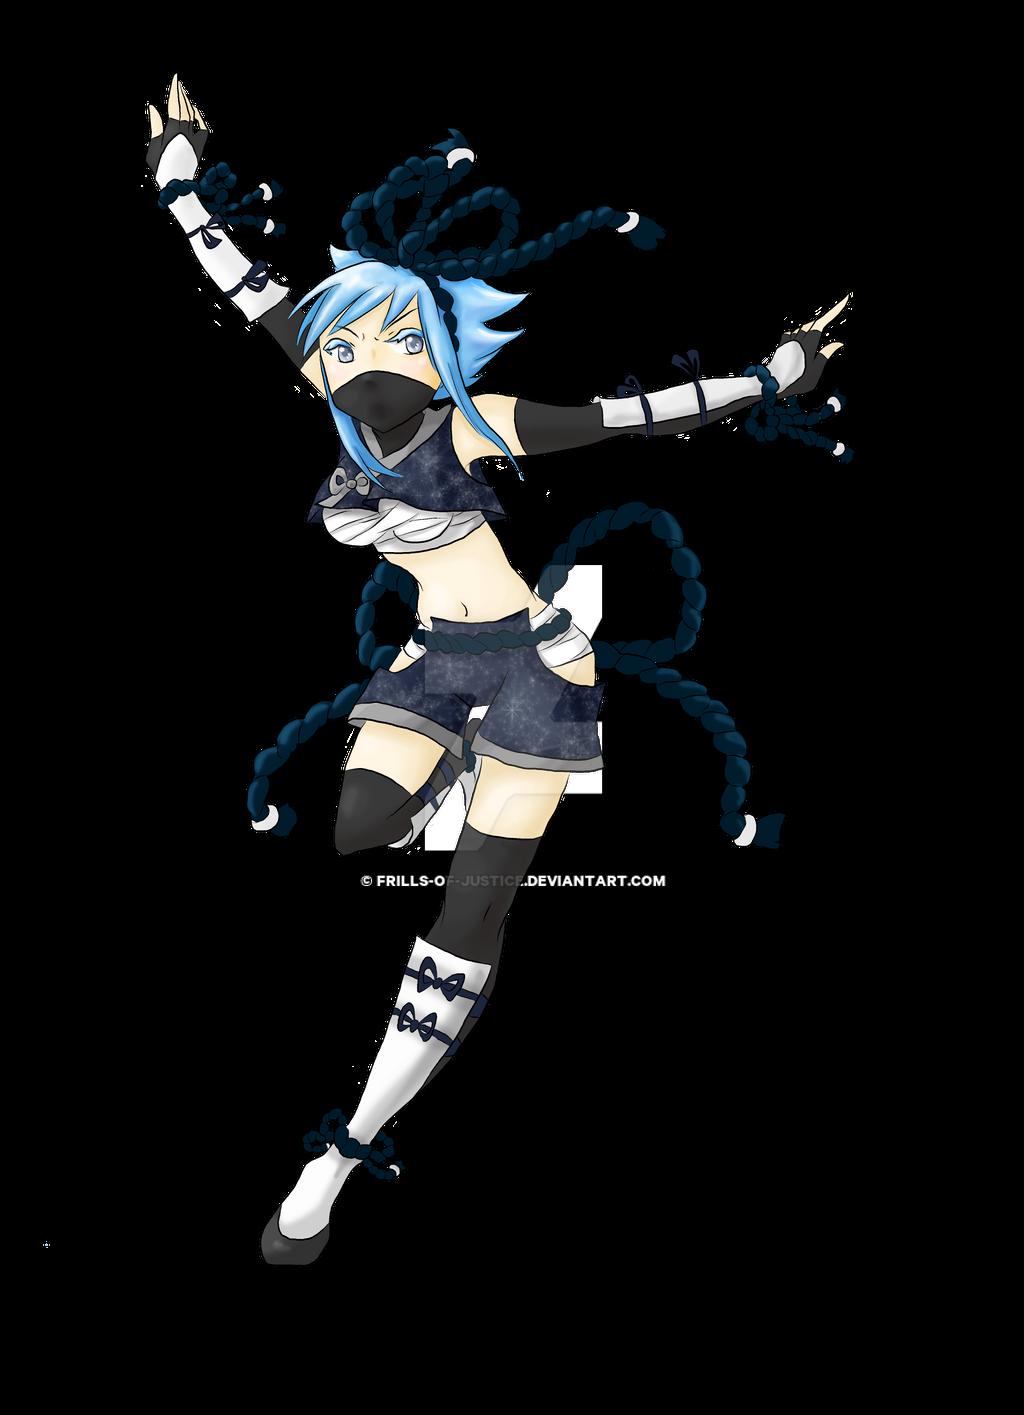 Mahou Kunoichi Hikaru! by Frills-Of-Justice